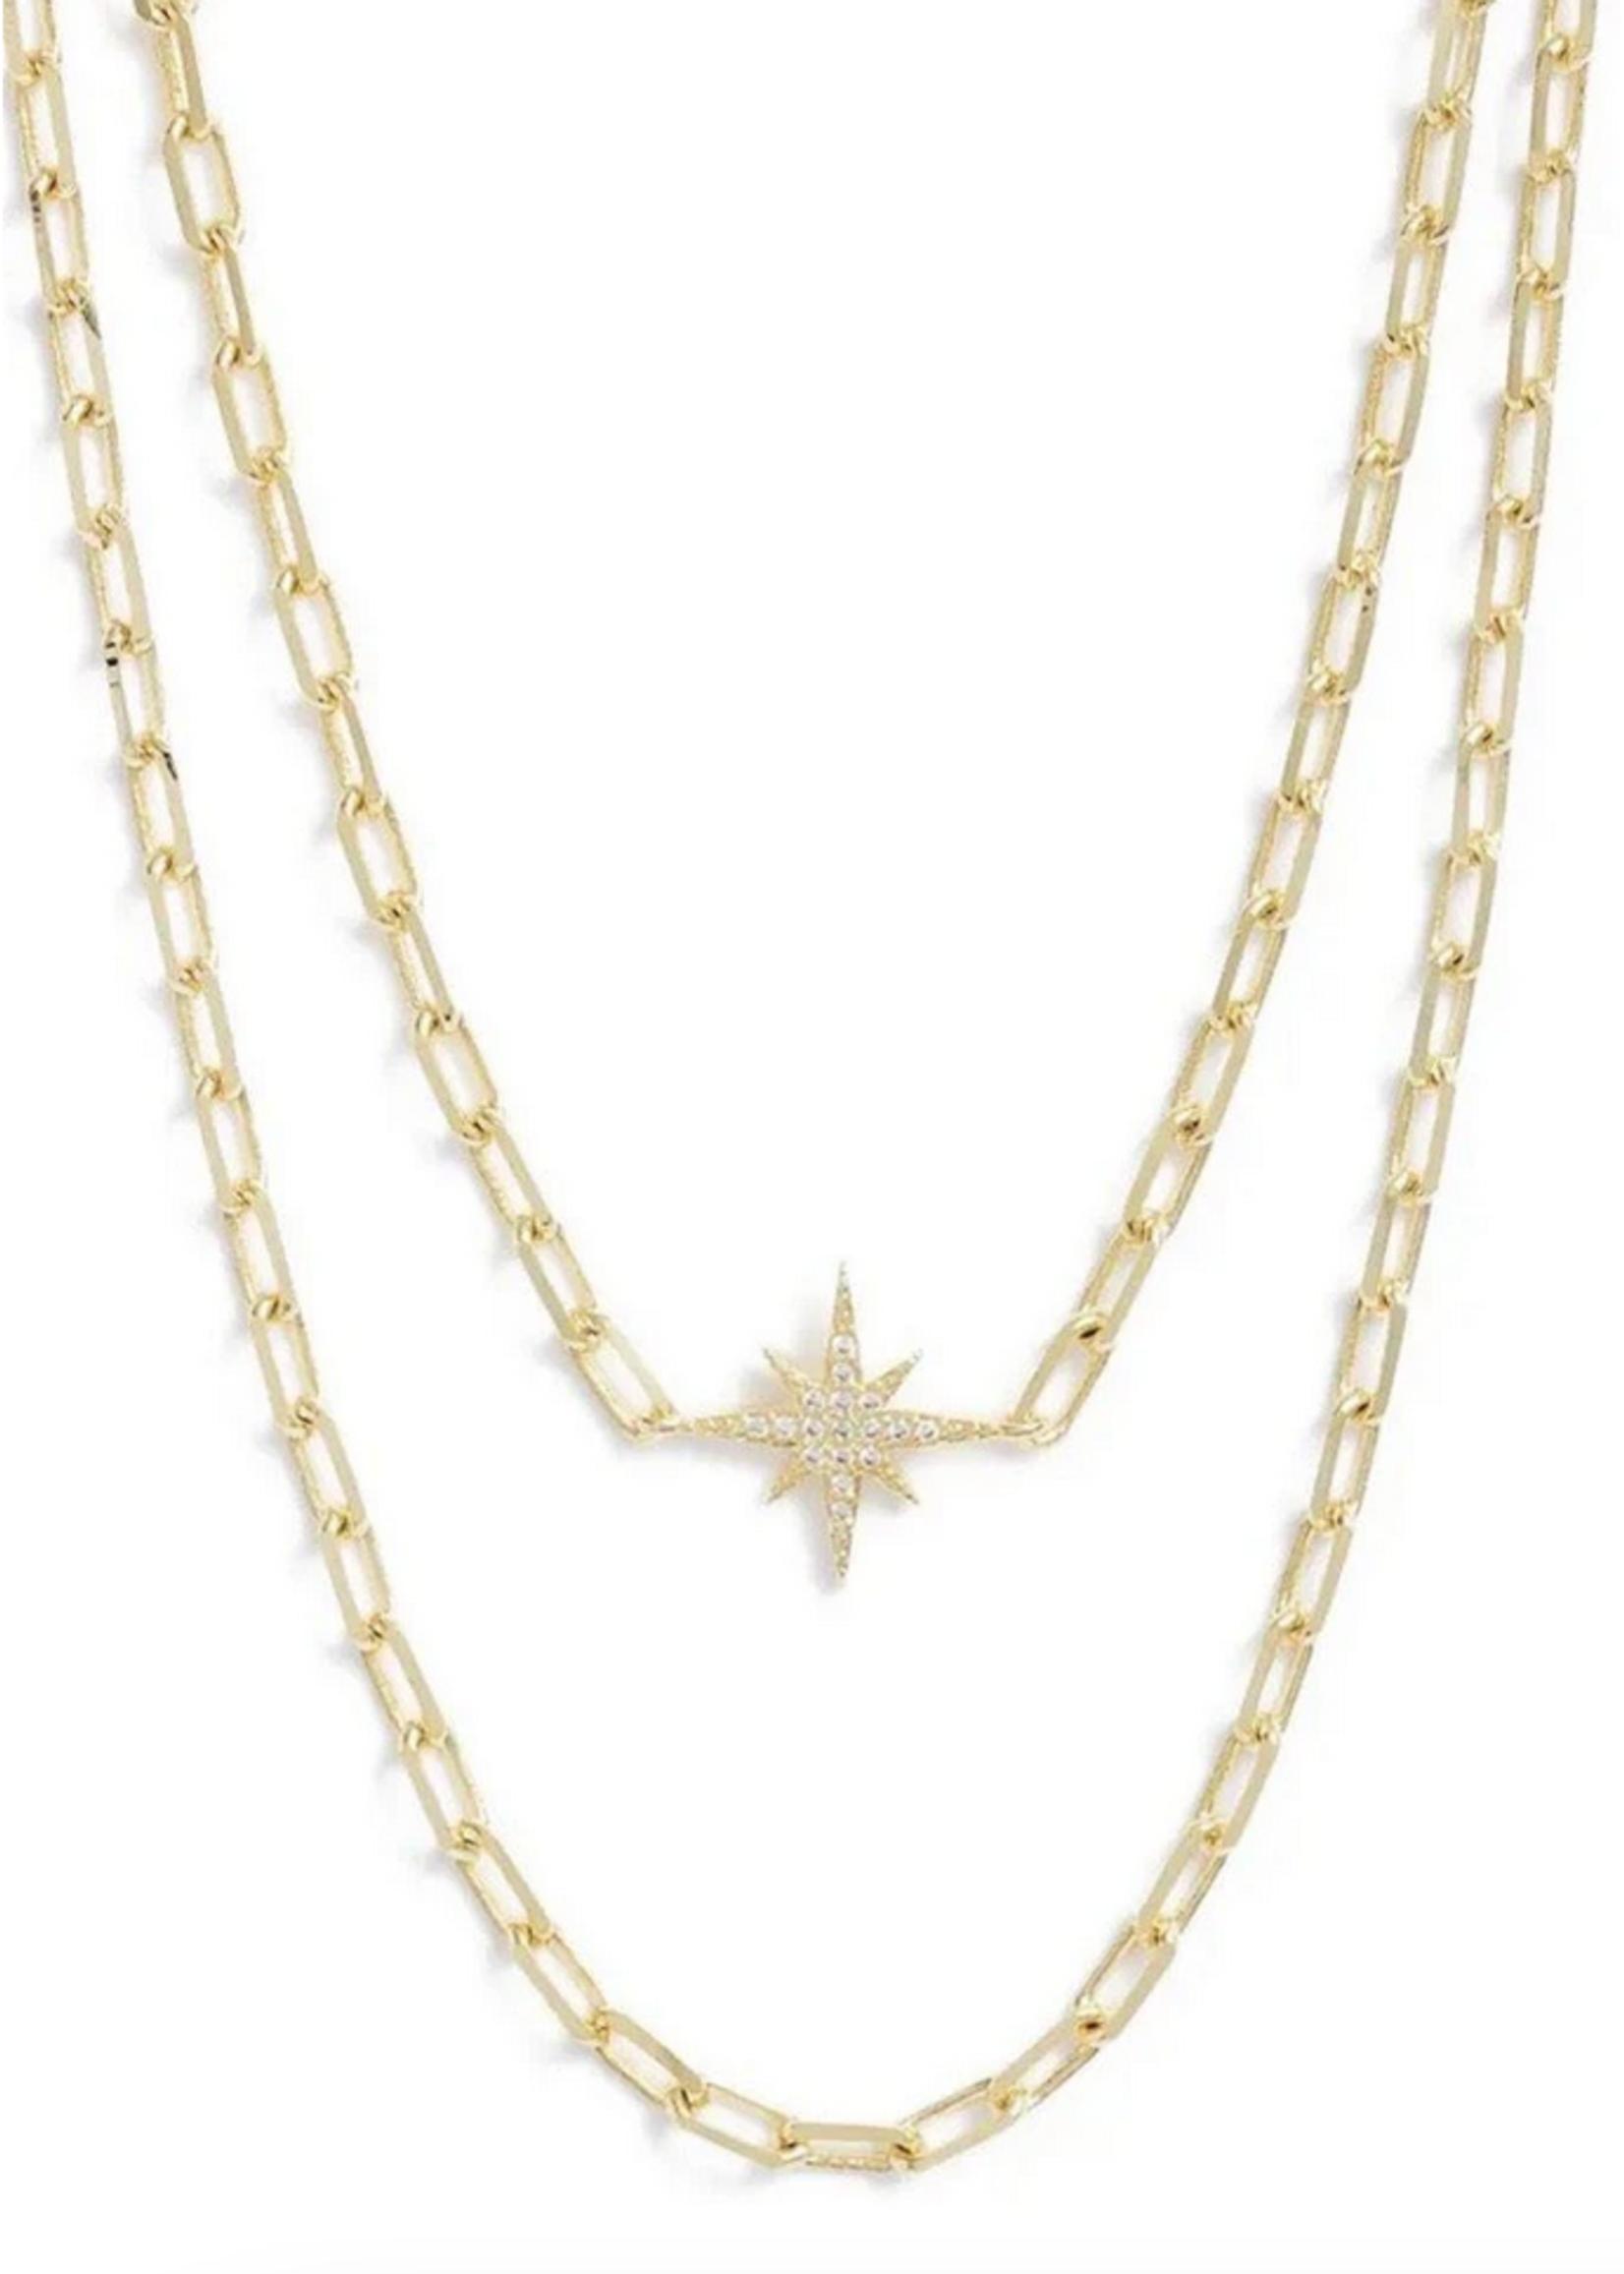 Elitaire Boutique Starburst Layered Necklace